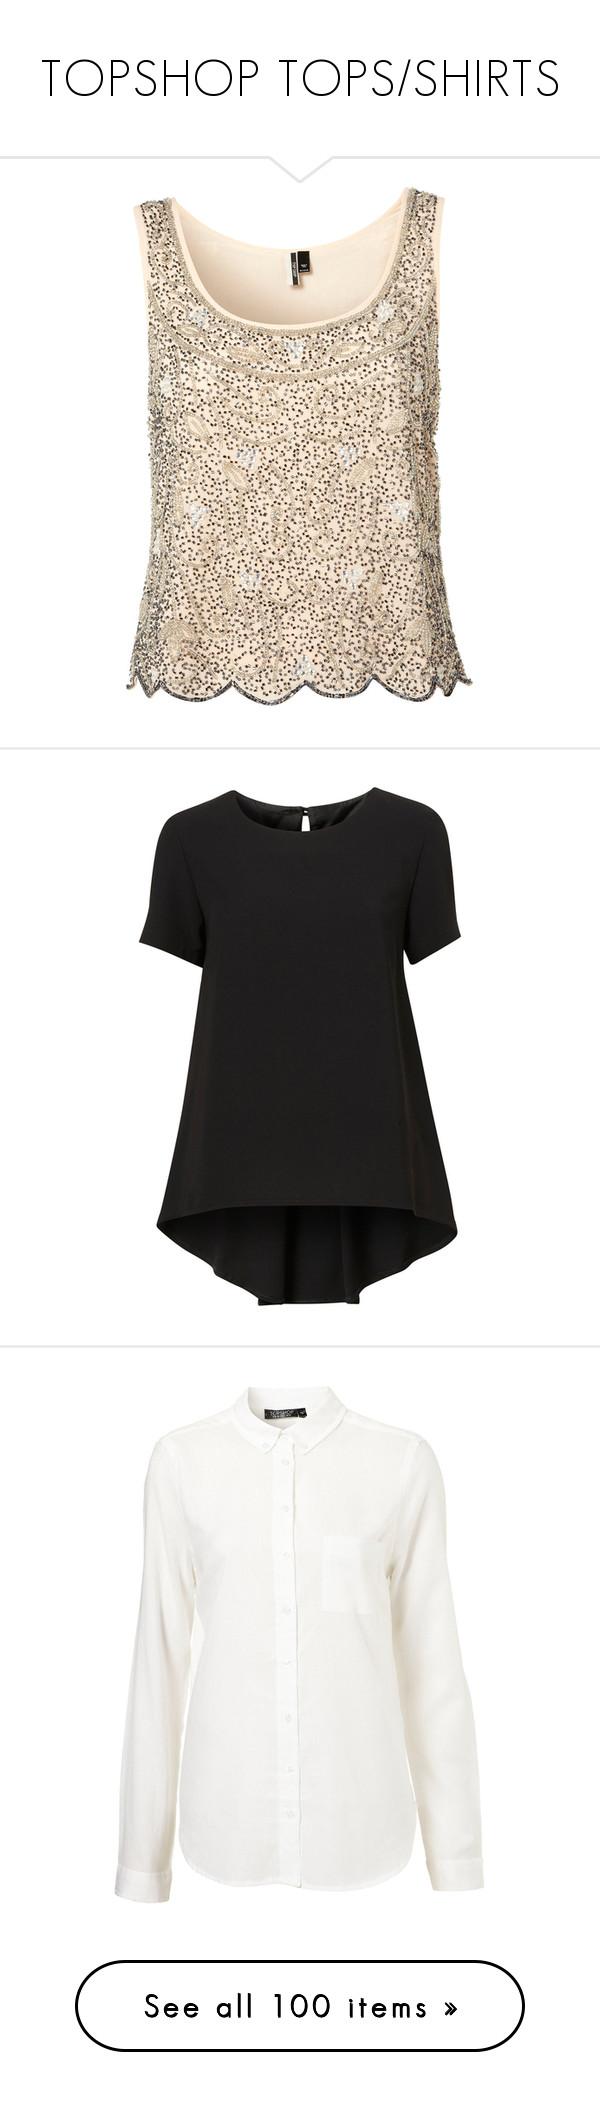 33aec2f140443e Topshop Shirts Polyvore - BCD Tofu House